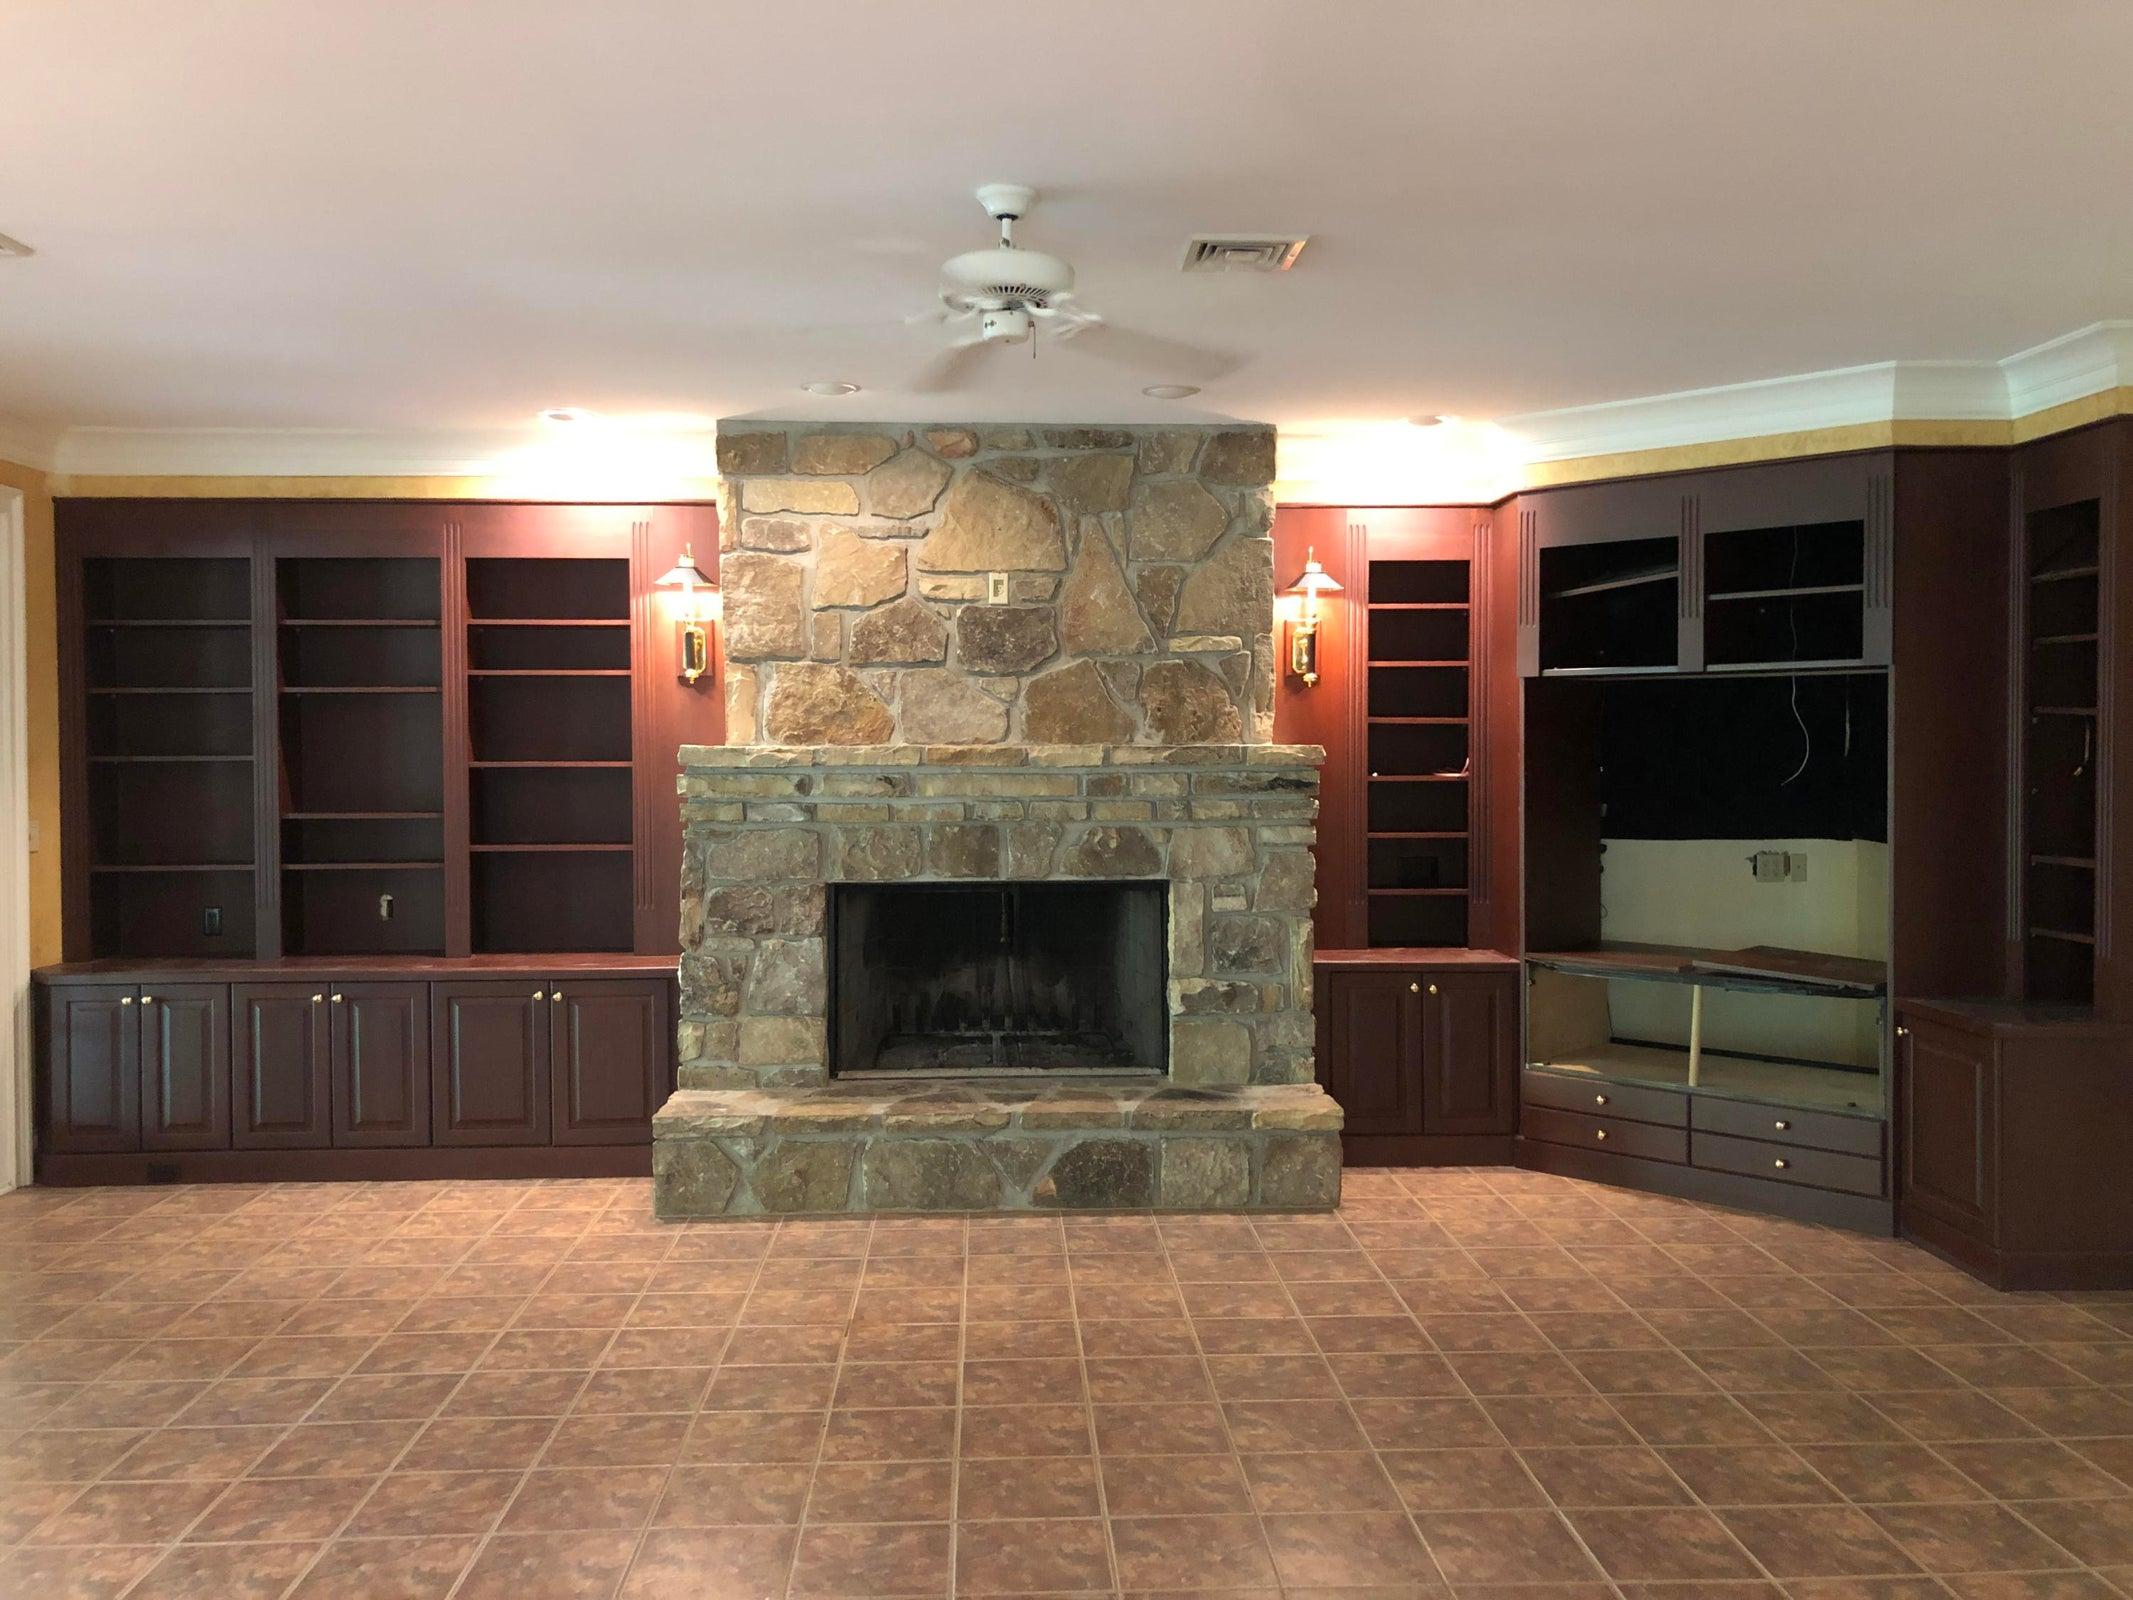 3rd fireplace in basement